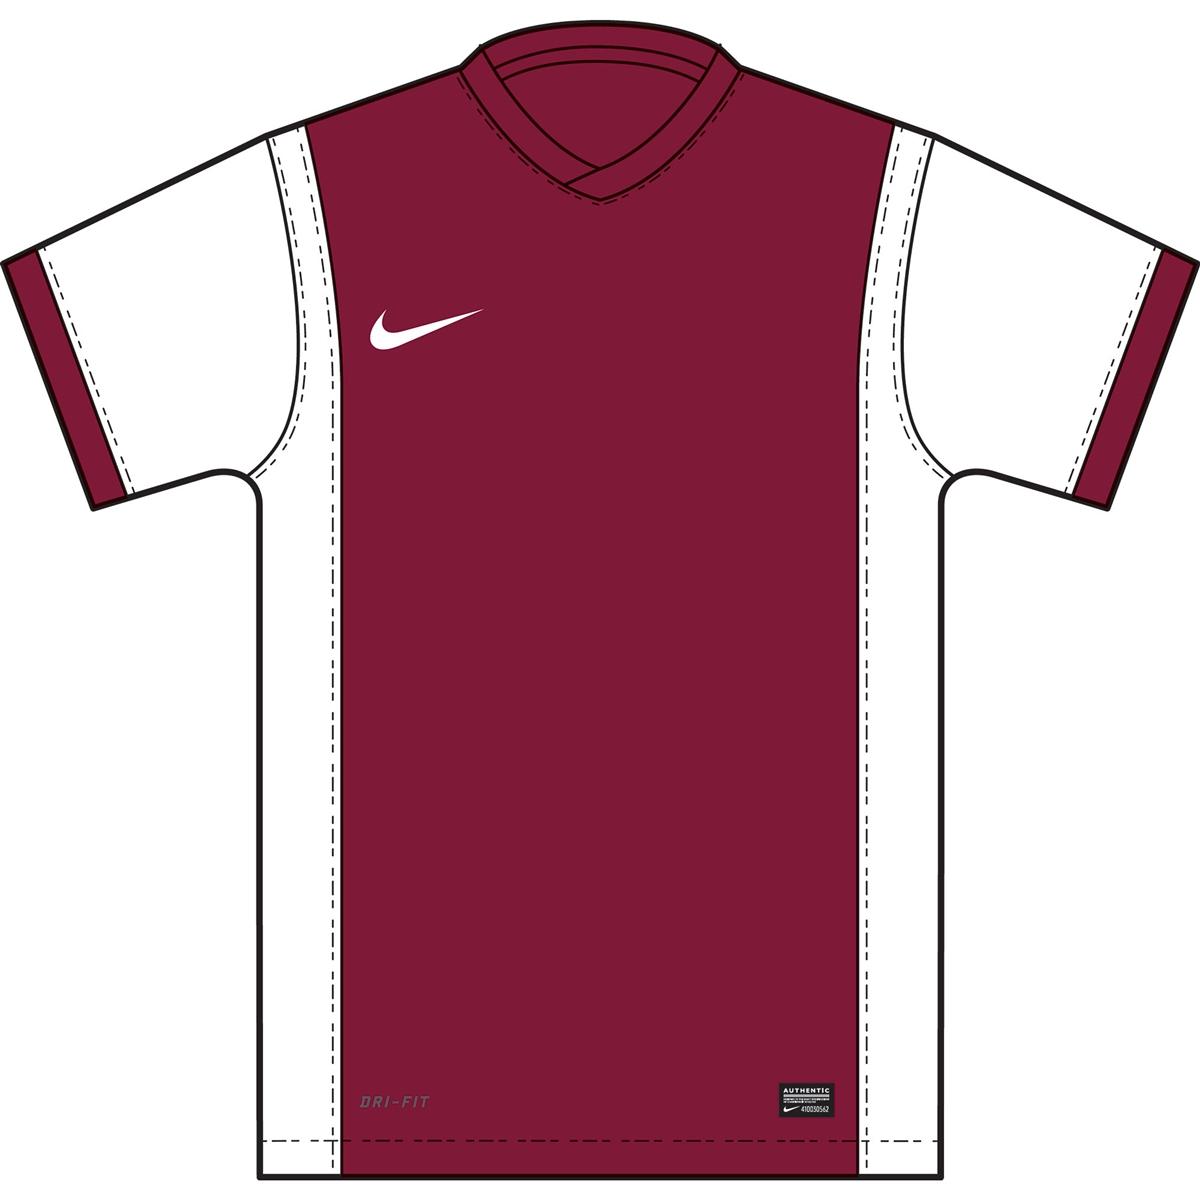 feec0c37bce Football Kit Templates. football teams shirt and kits fan week 2 ...